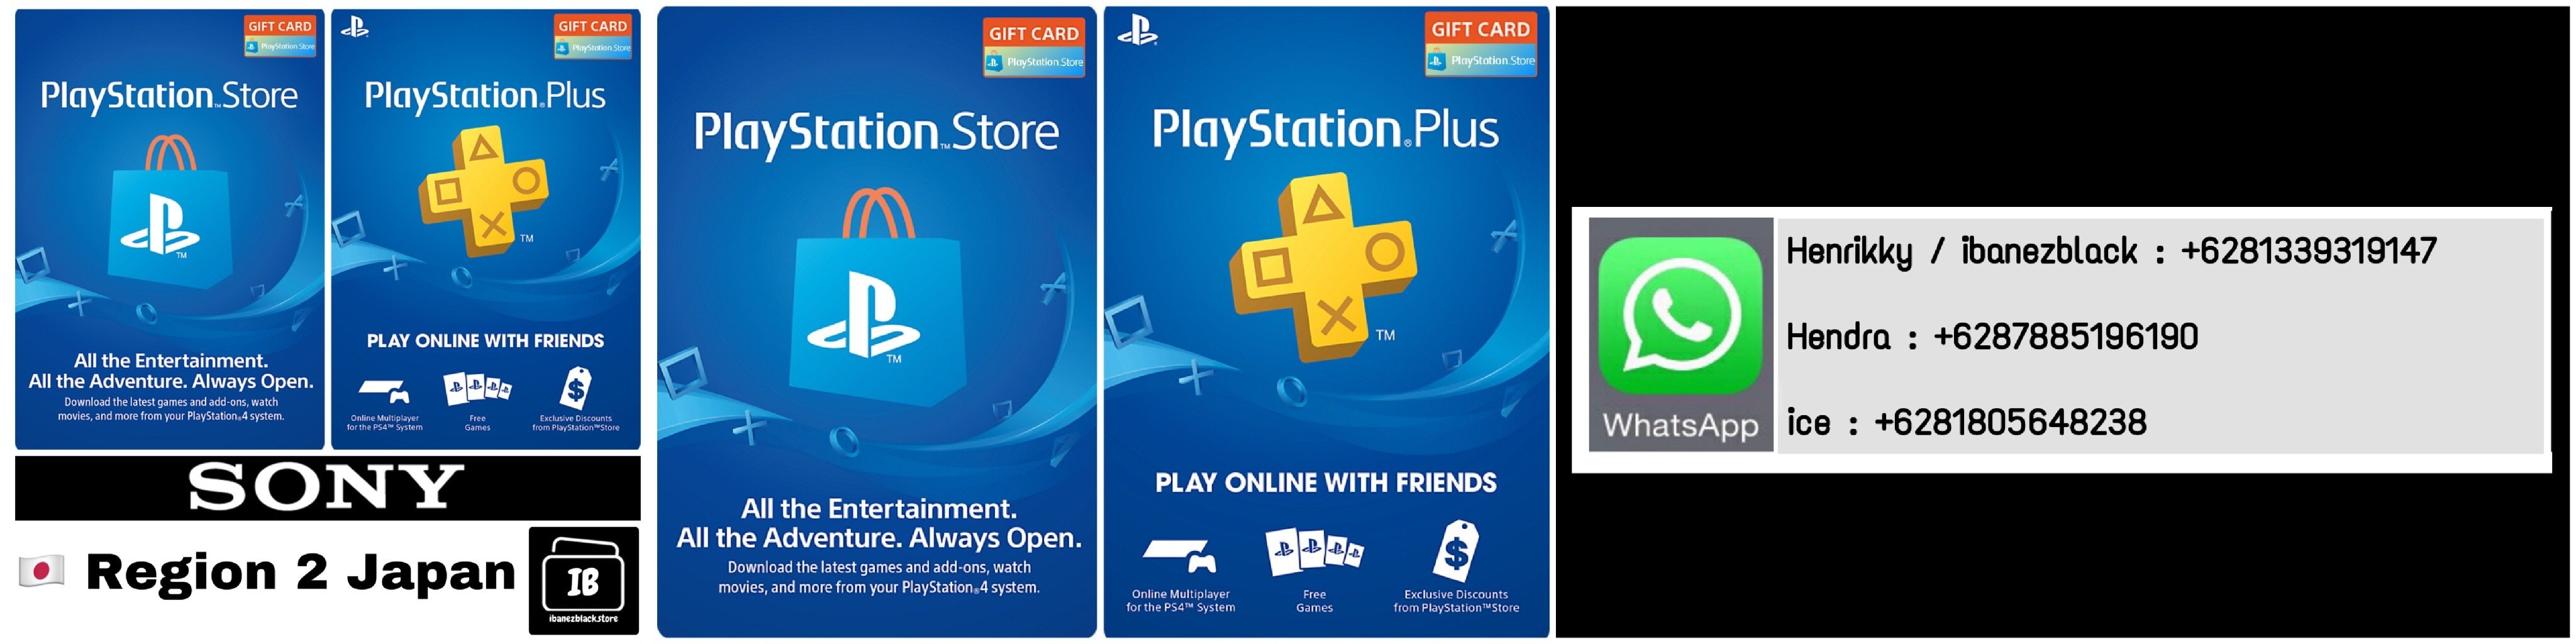 Playstation Store Gift Card (PSN Card) / Playstation Plus (PSN Plus) Japan